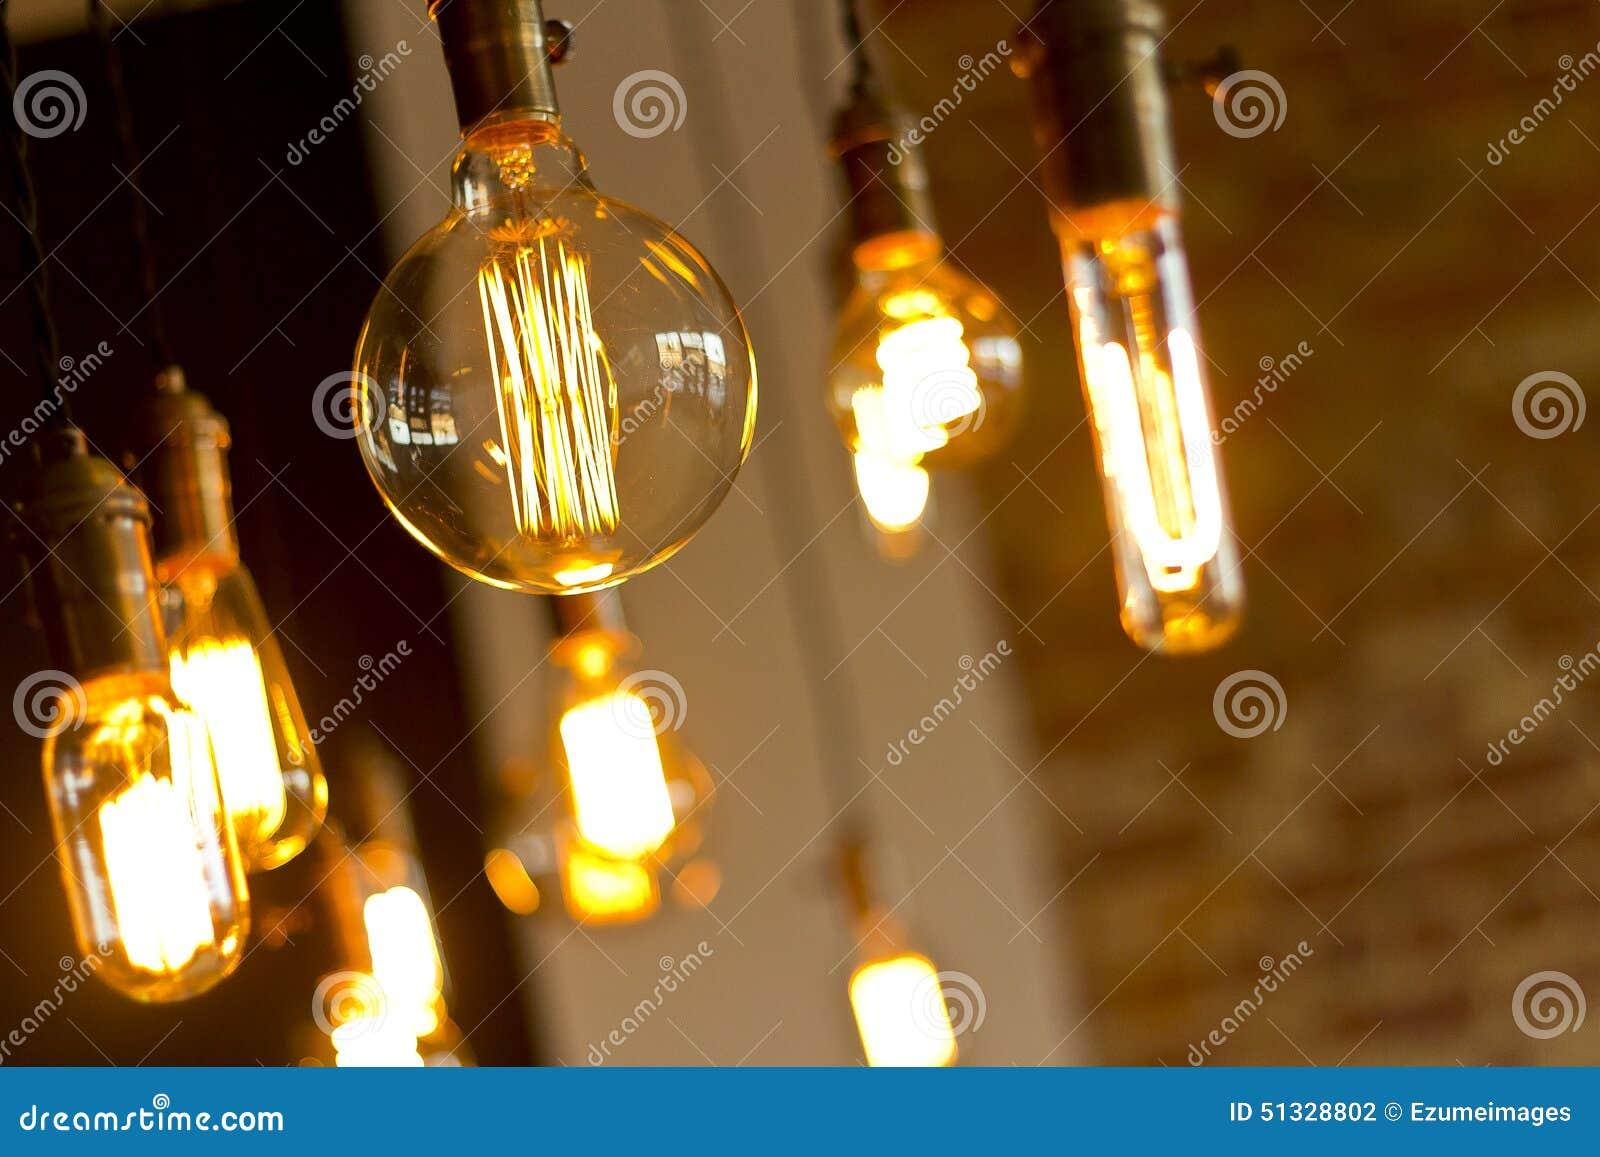 antique background brick bulbs decorative edison light - Antique Light Bulbs